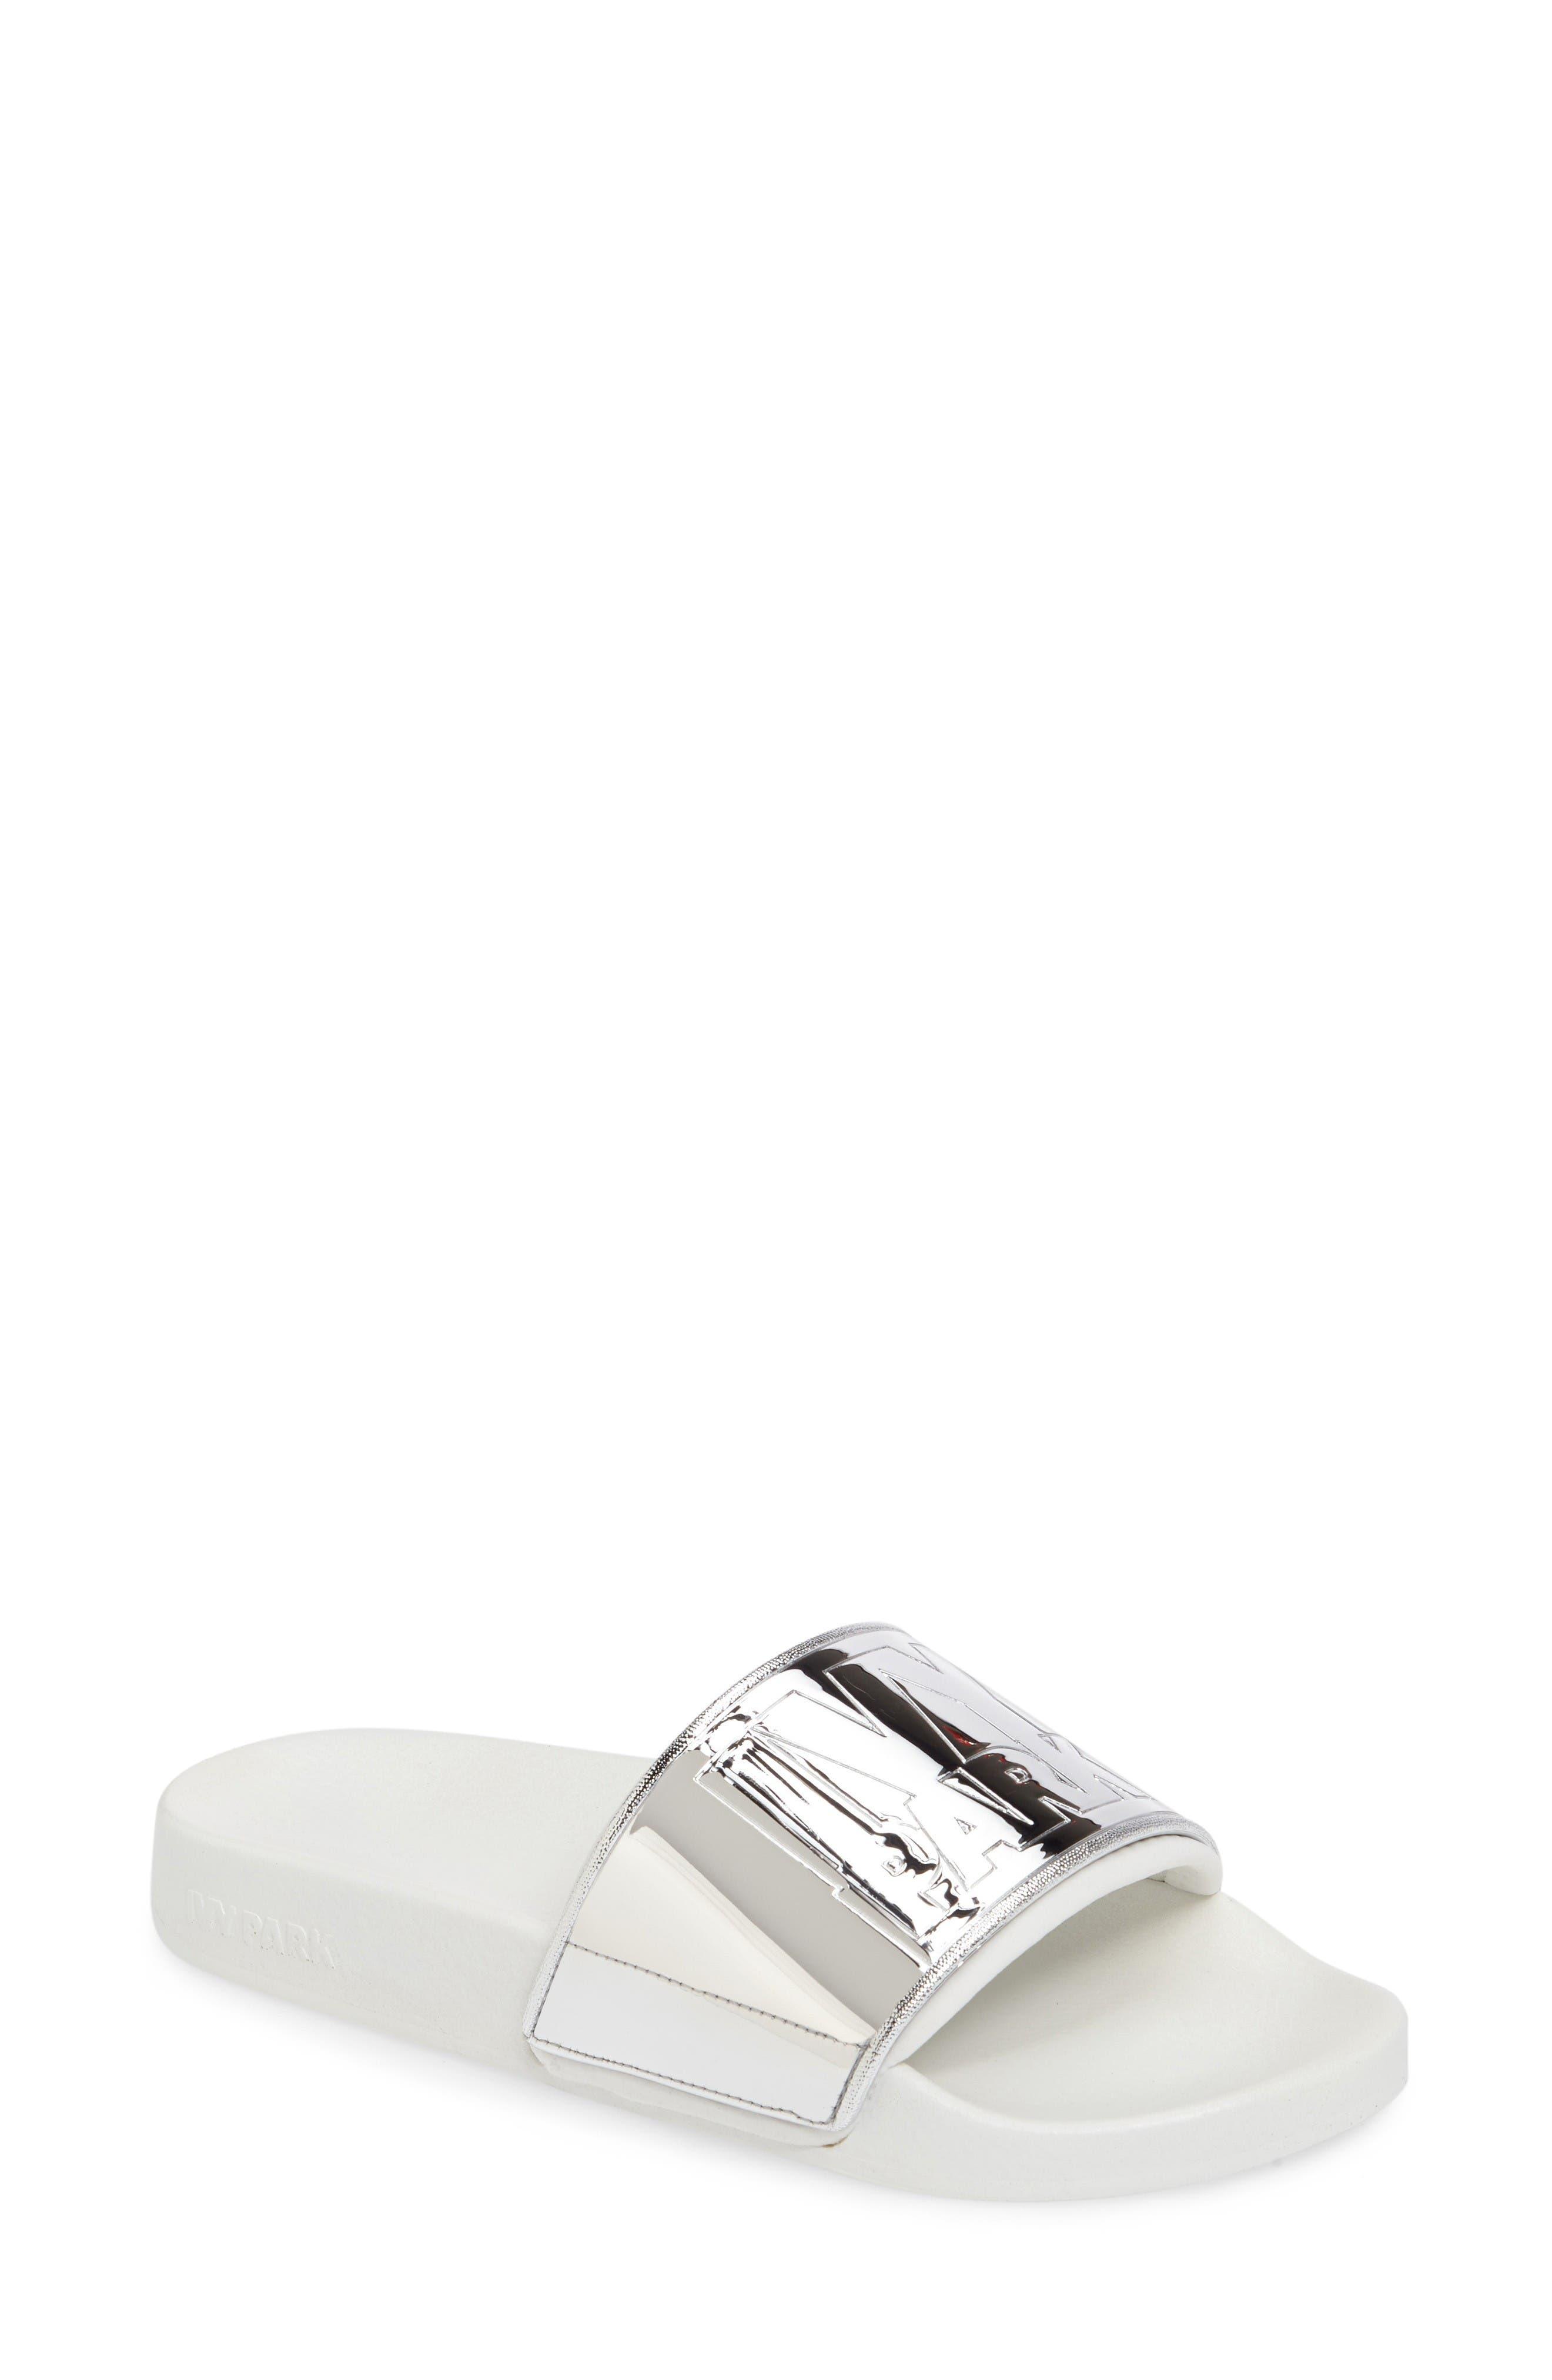 IVY PARK Mirror Logo Slide Sandal